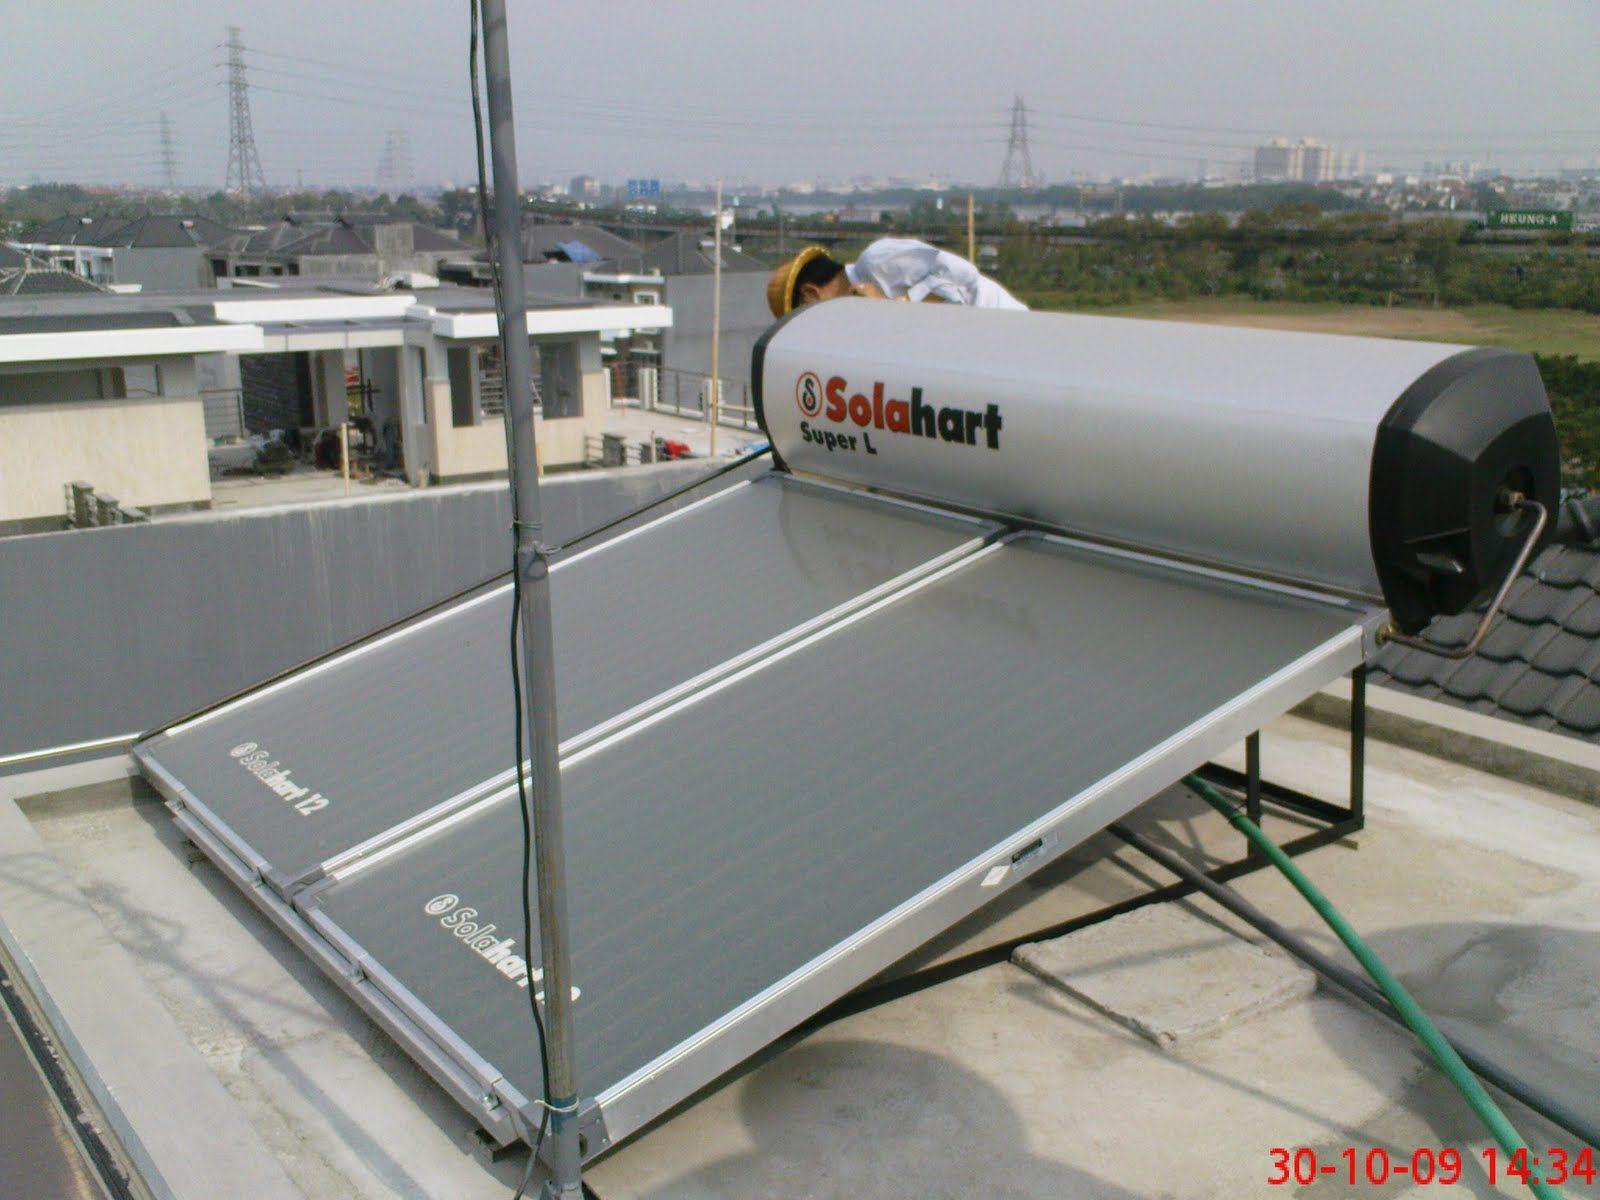 Service Solahart Telp +(021) 34082652– 082122541663 Service Solahart Cabang Jakarta Barat Kami Dari CV. Davinatama Service Menyediakan Jasa Perbaikan Pemanas Air SOLAHART SERVICE & PENJUALAN Pemanas air solar water heater tenaga matahari khususnya SOLAHART CV. Davinatama Service Nomer Telpon: +6221 34082652 Fax : +6221 48702925 Melayani : Jabodetabek Email: davinatama@yahoo.com Website : http://www.service-solahart.com